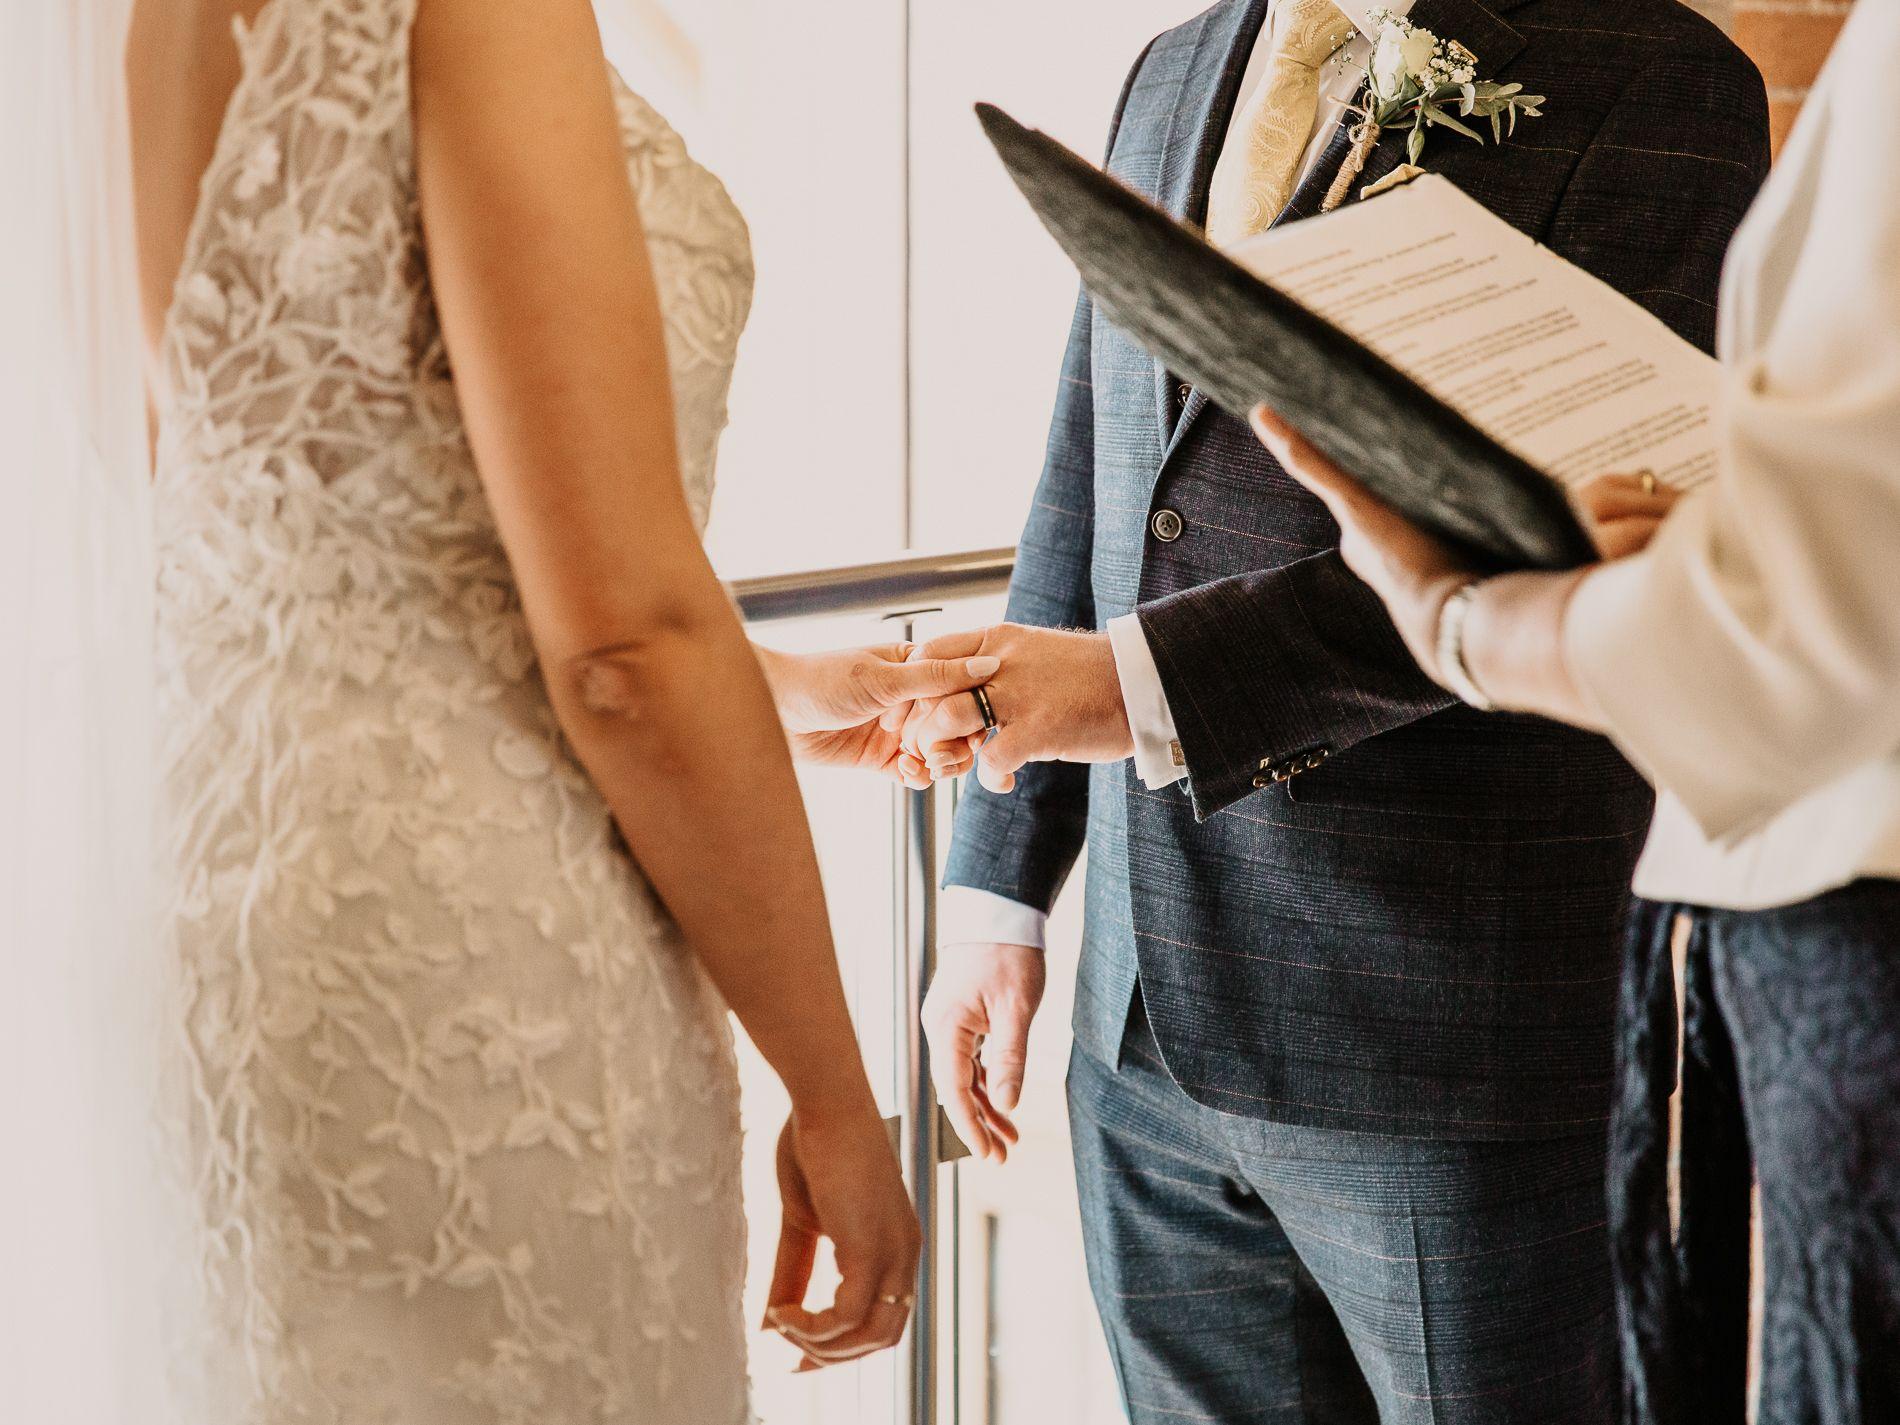 vow renewal wedding photography